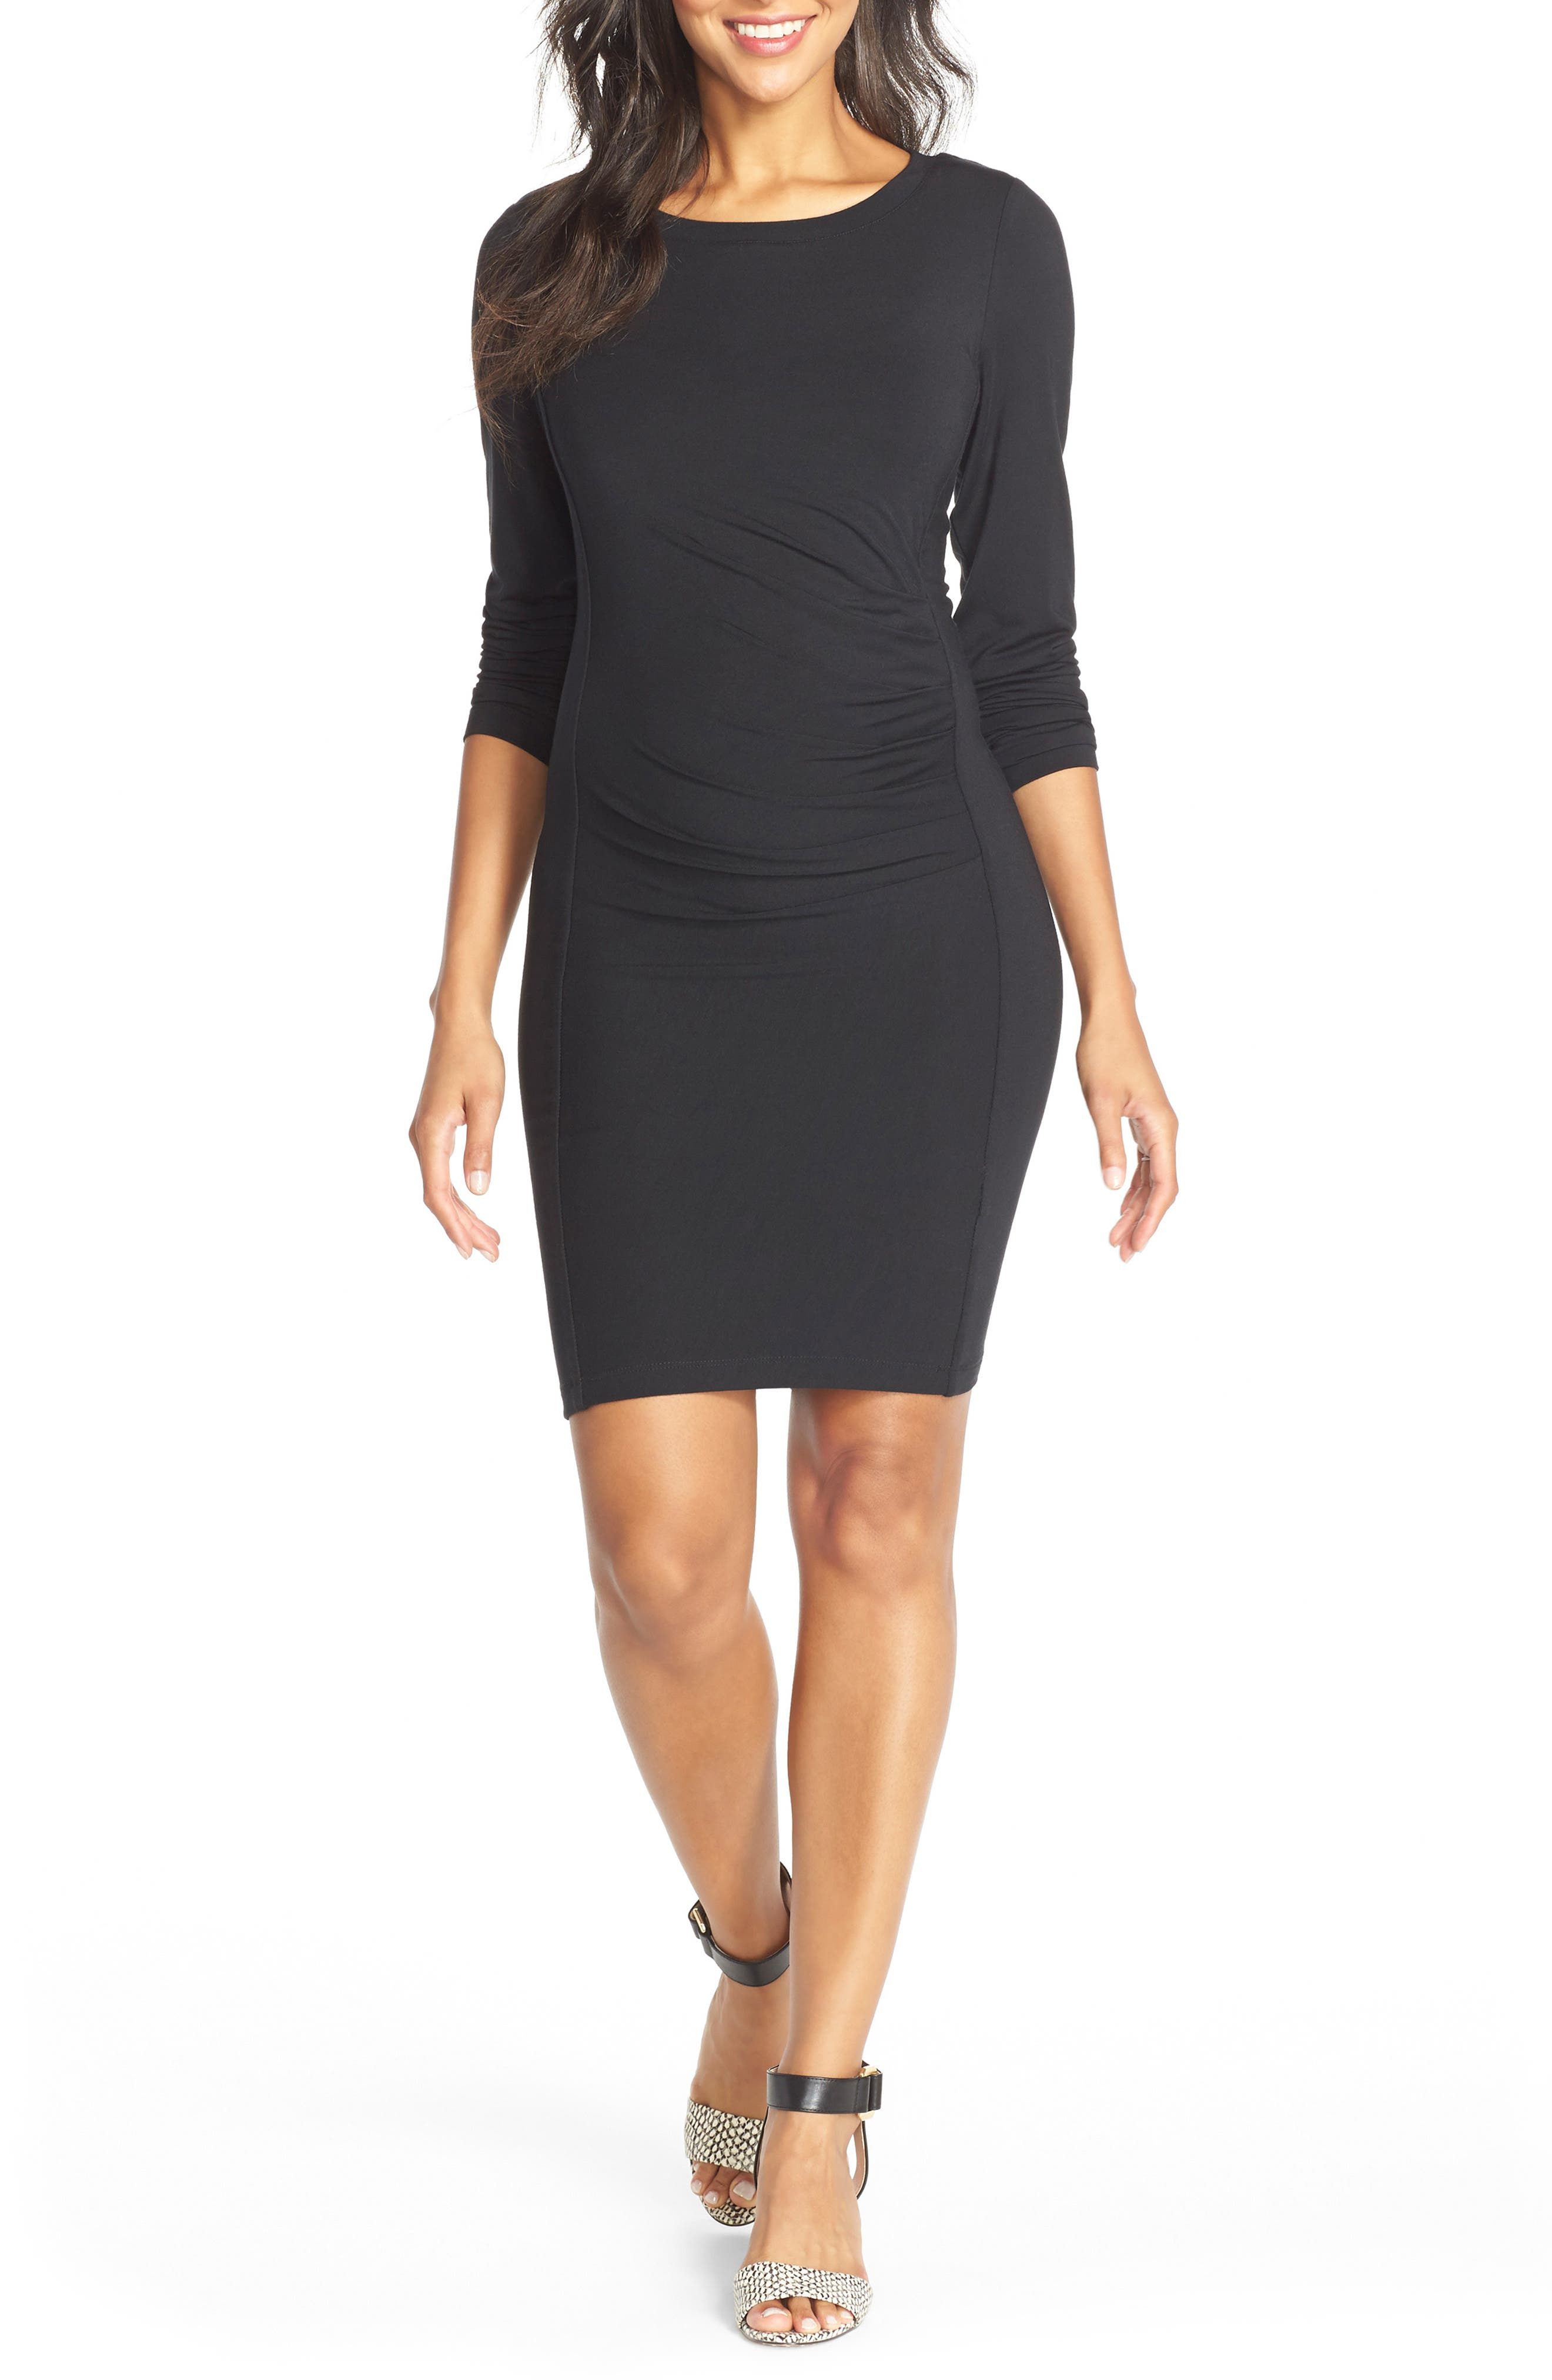 TART MATERNITY 'Whitney' Maternity Dress, Main, color, BLACK